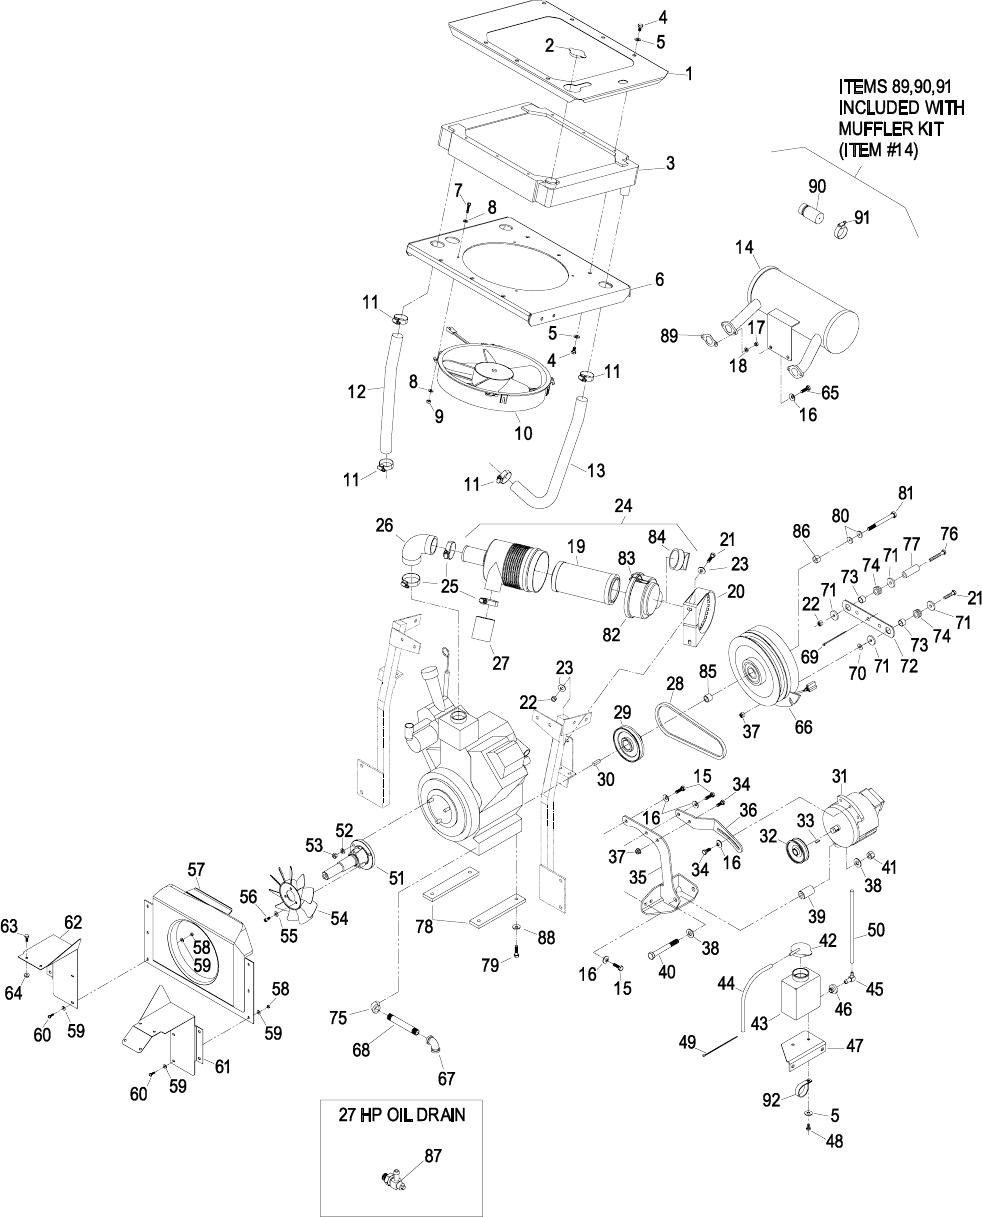 Exmark Lazer Z 103 0656 Parts Manual ManualsLib Makes It